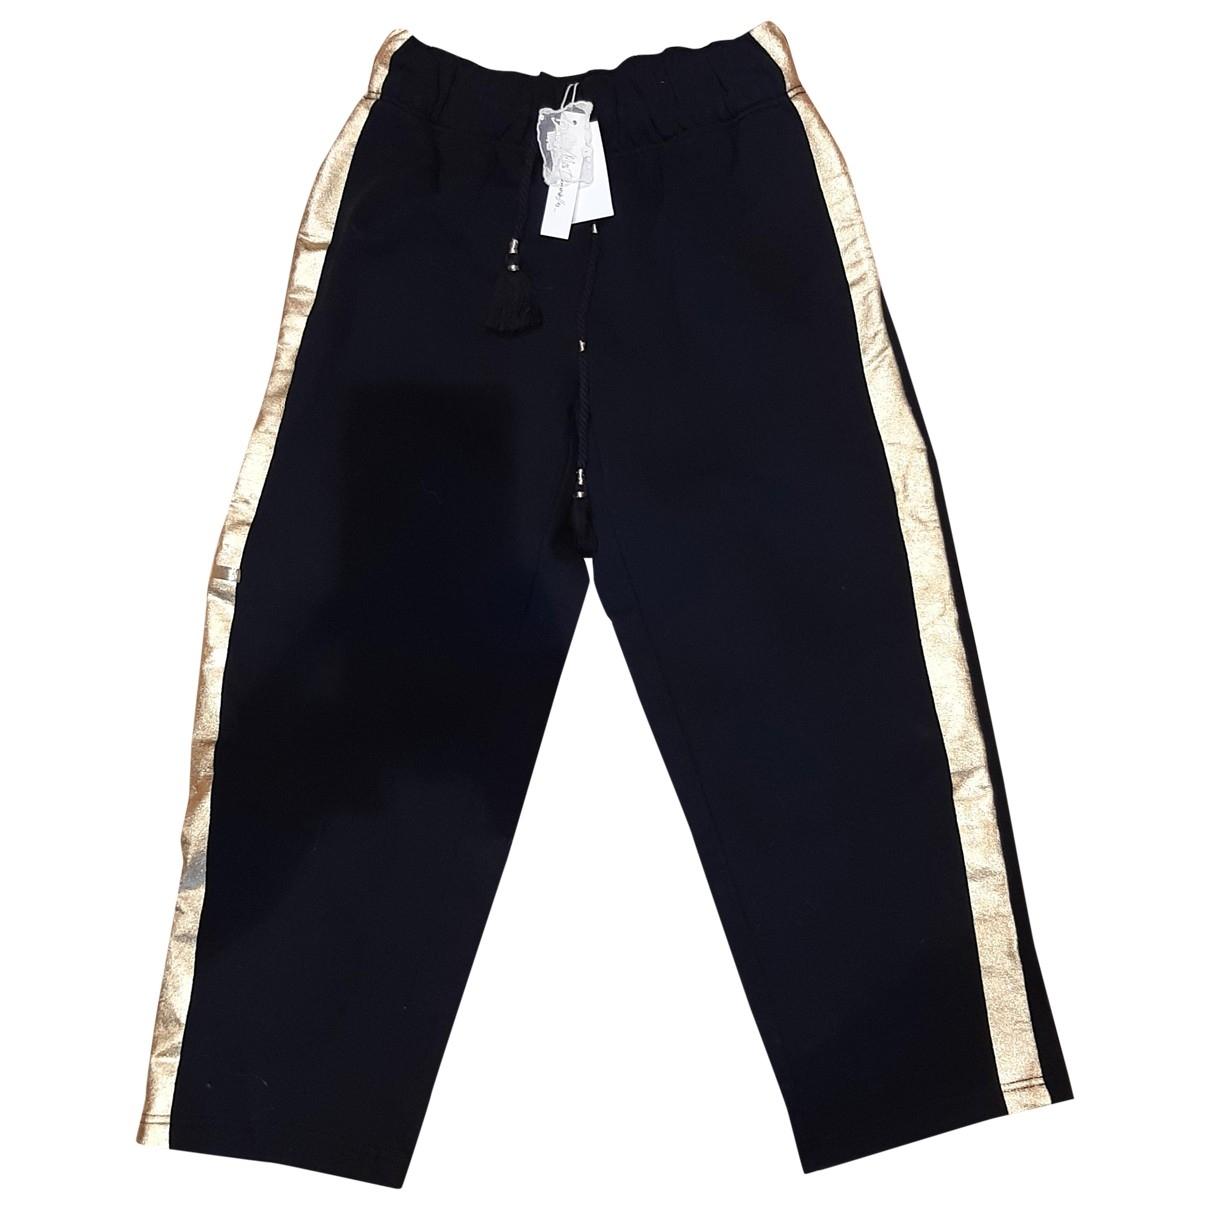 Mes Demoiselles ... \N Black Trousers for Women 1 0-5